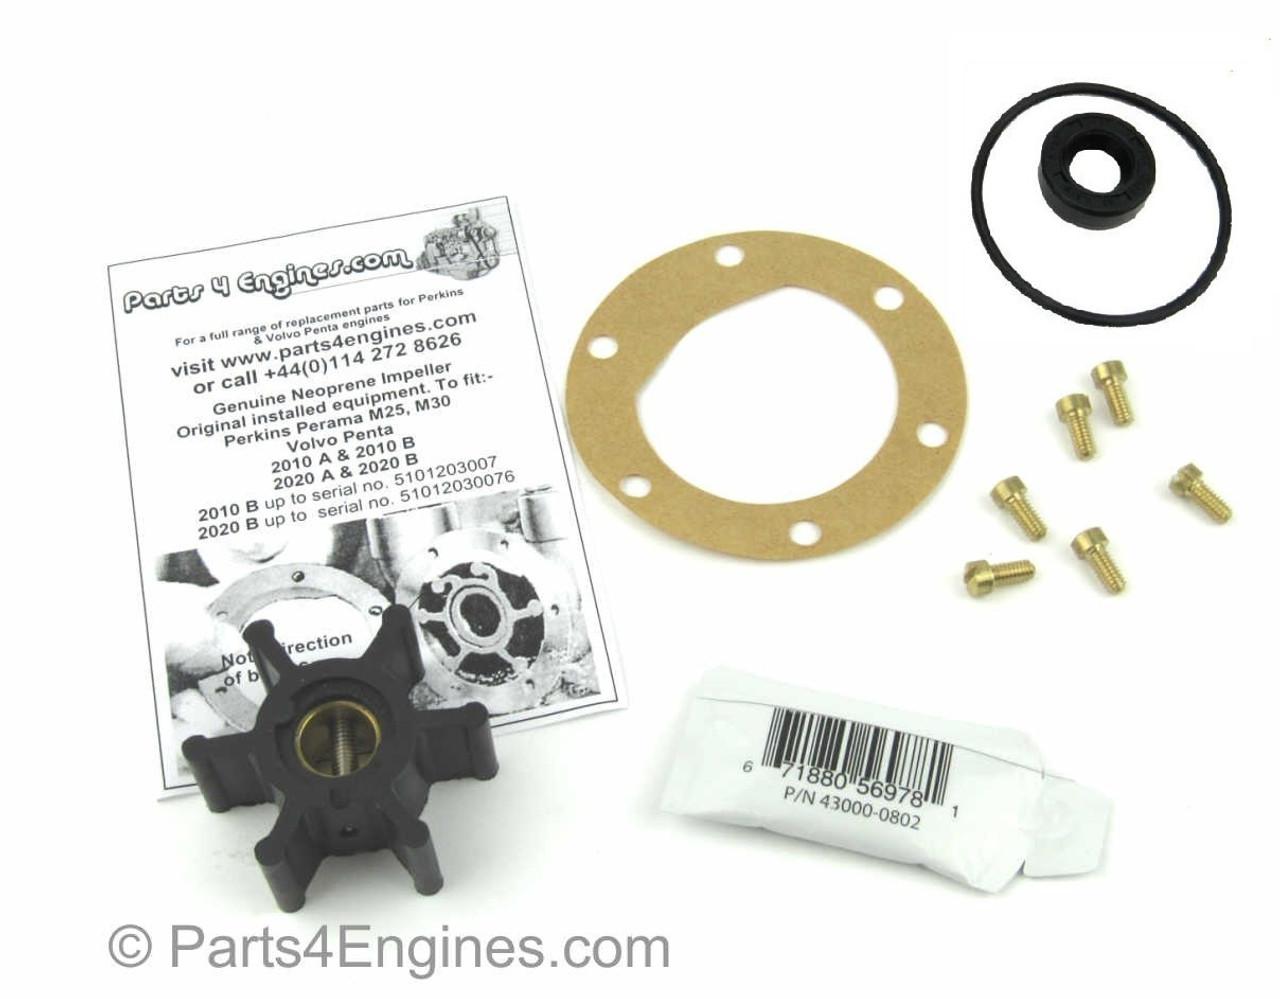 Perkins Perama M35 raw water pump service kit - parts4engines.com